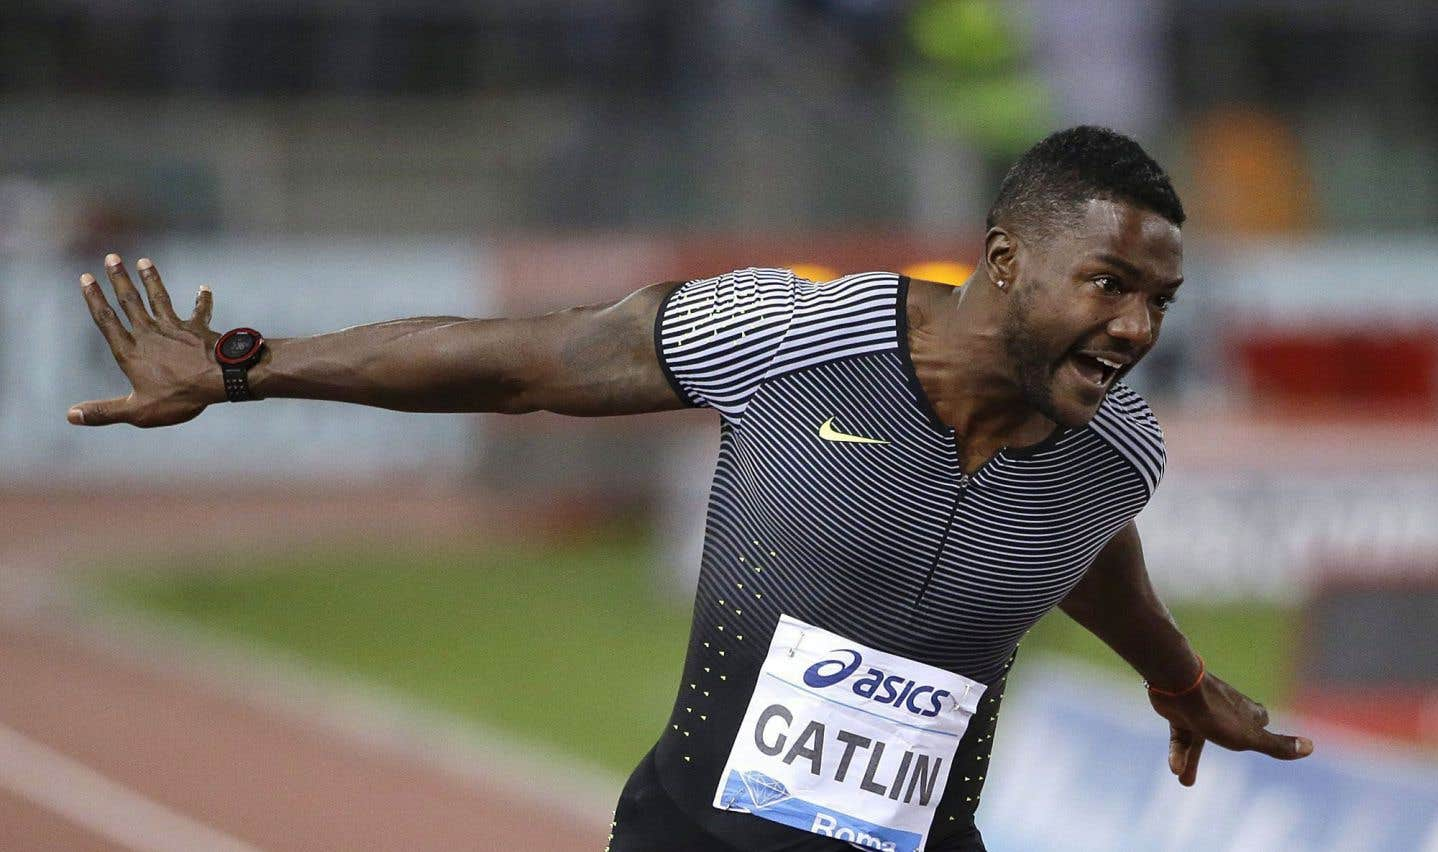 L'athlète américain Justin Gatlin